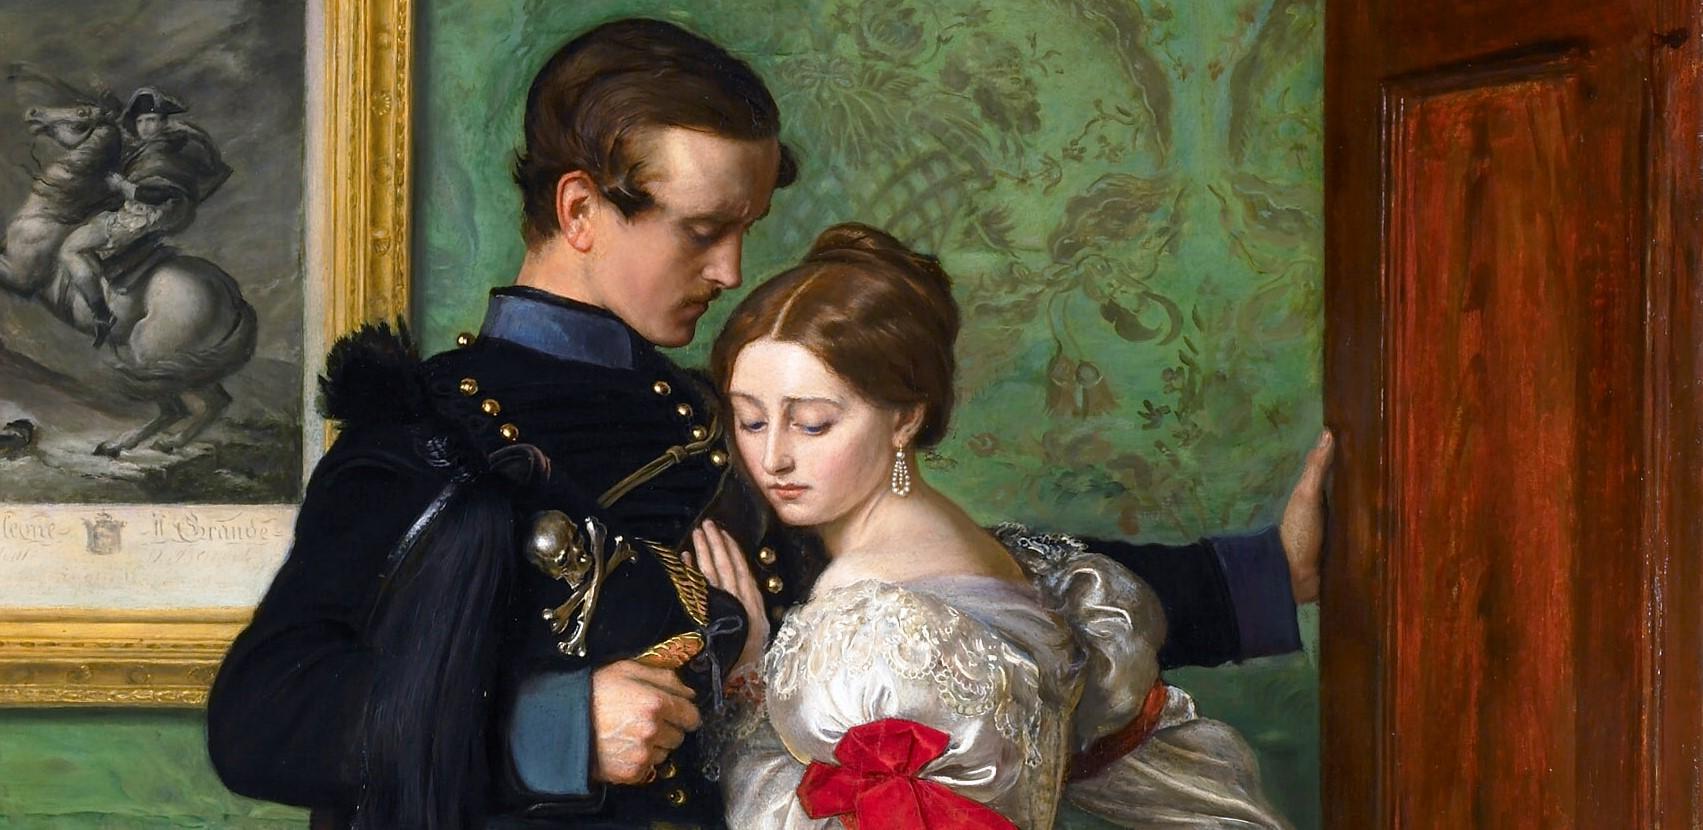 The Black Brunswicker de John Everett Millais 1860 Lady Lever Art Gallery (Liverpool)